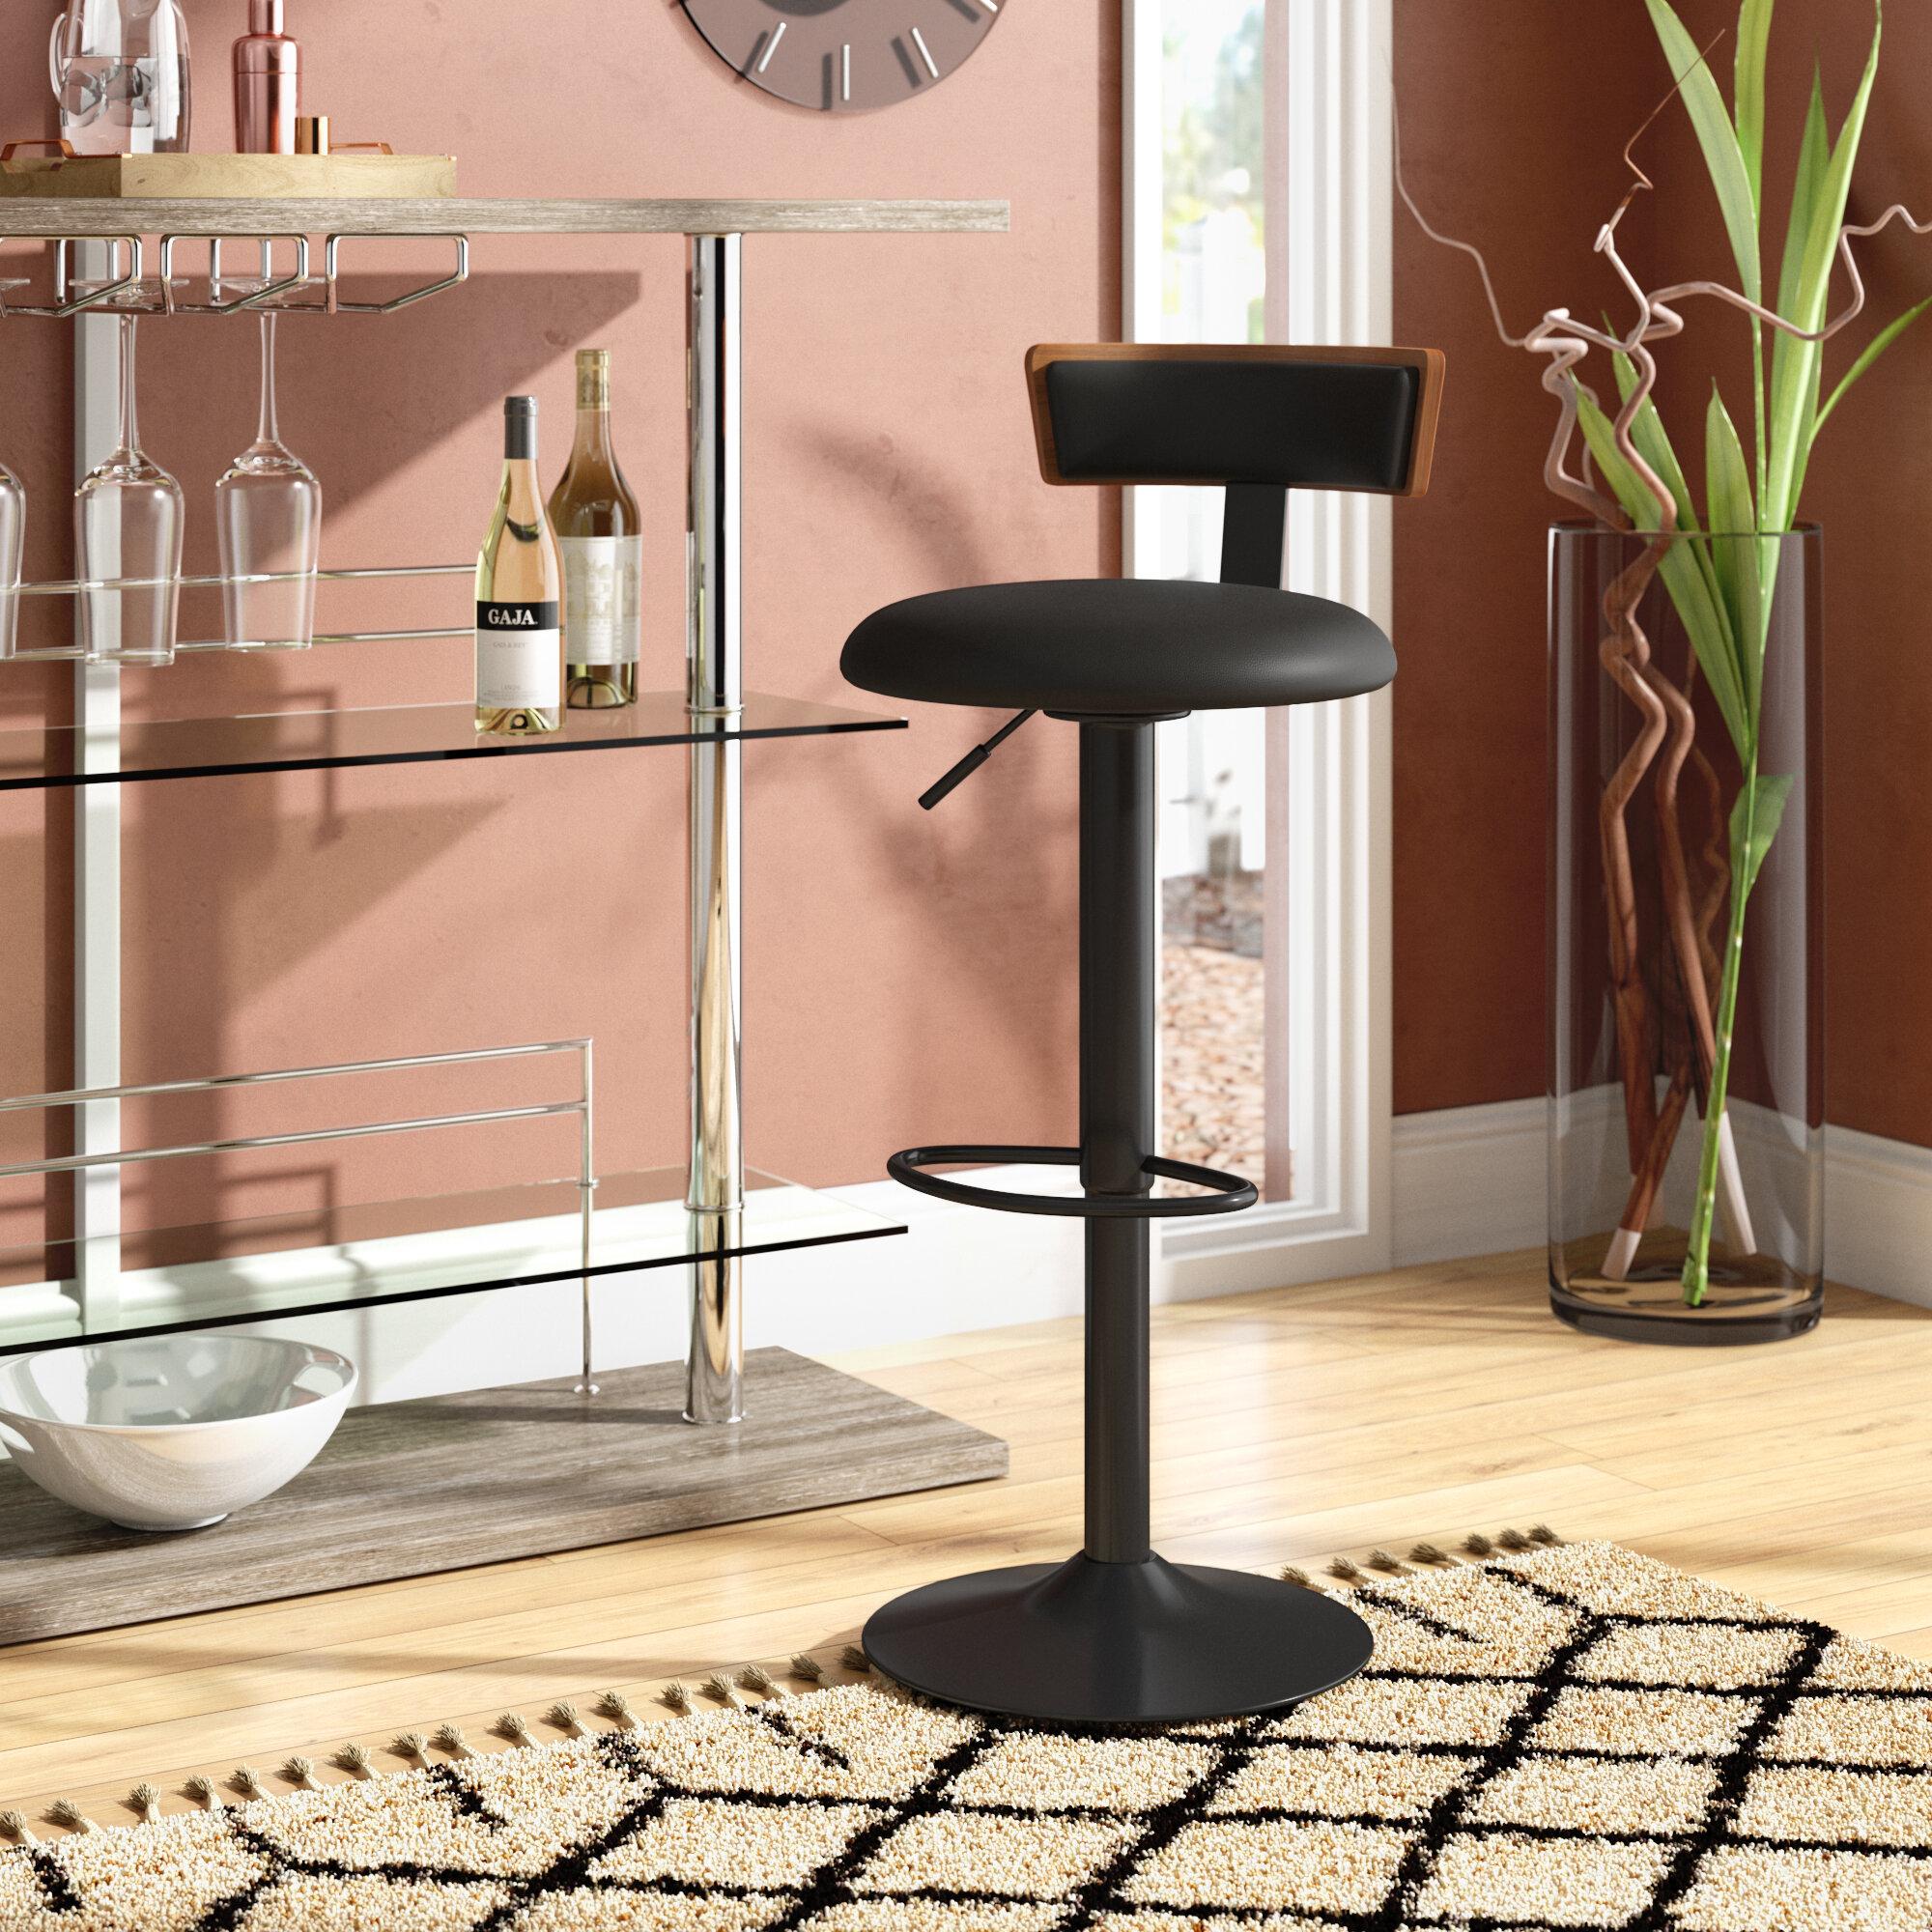 Fantastic Tyner Adjustable Height Swivel Bar Stool Creativecarmelina Interior Chair Design Creativecarmelinacom